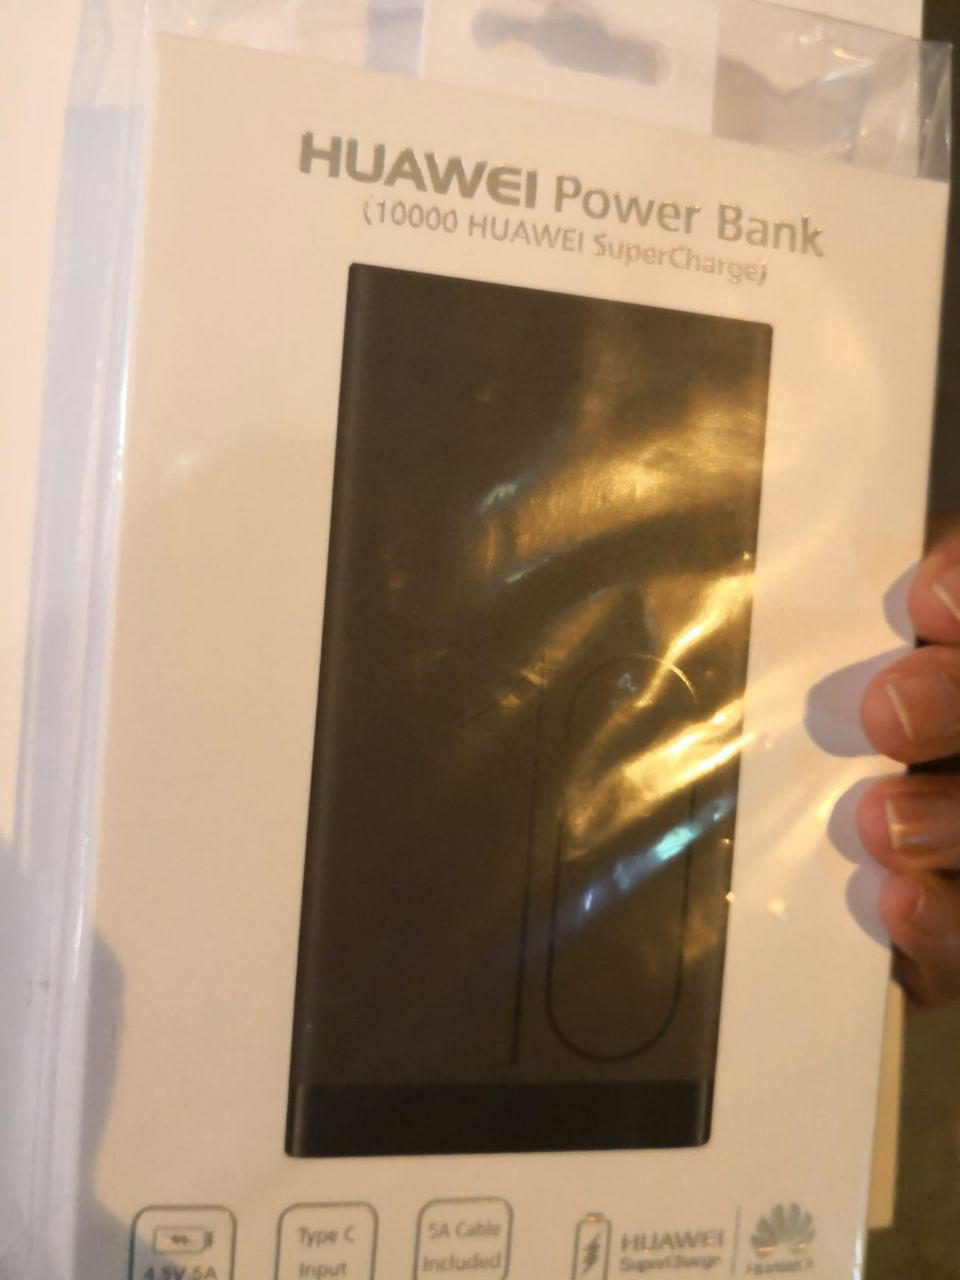 Huawei แจก Power Bank